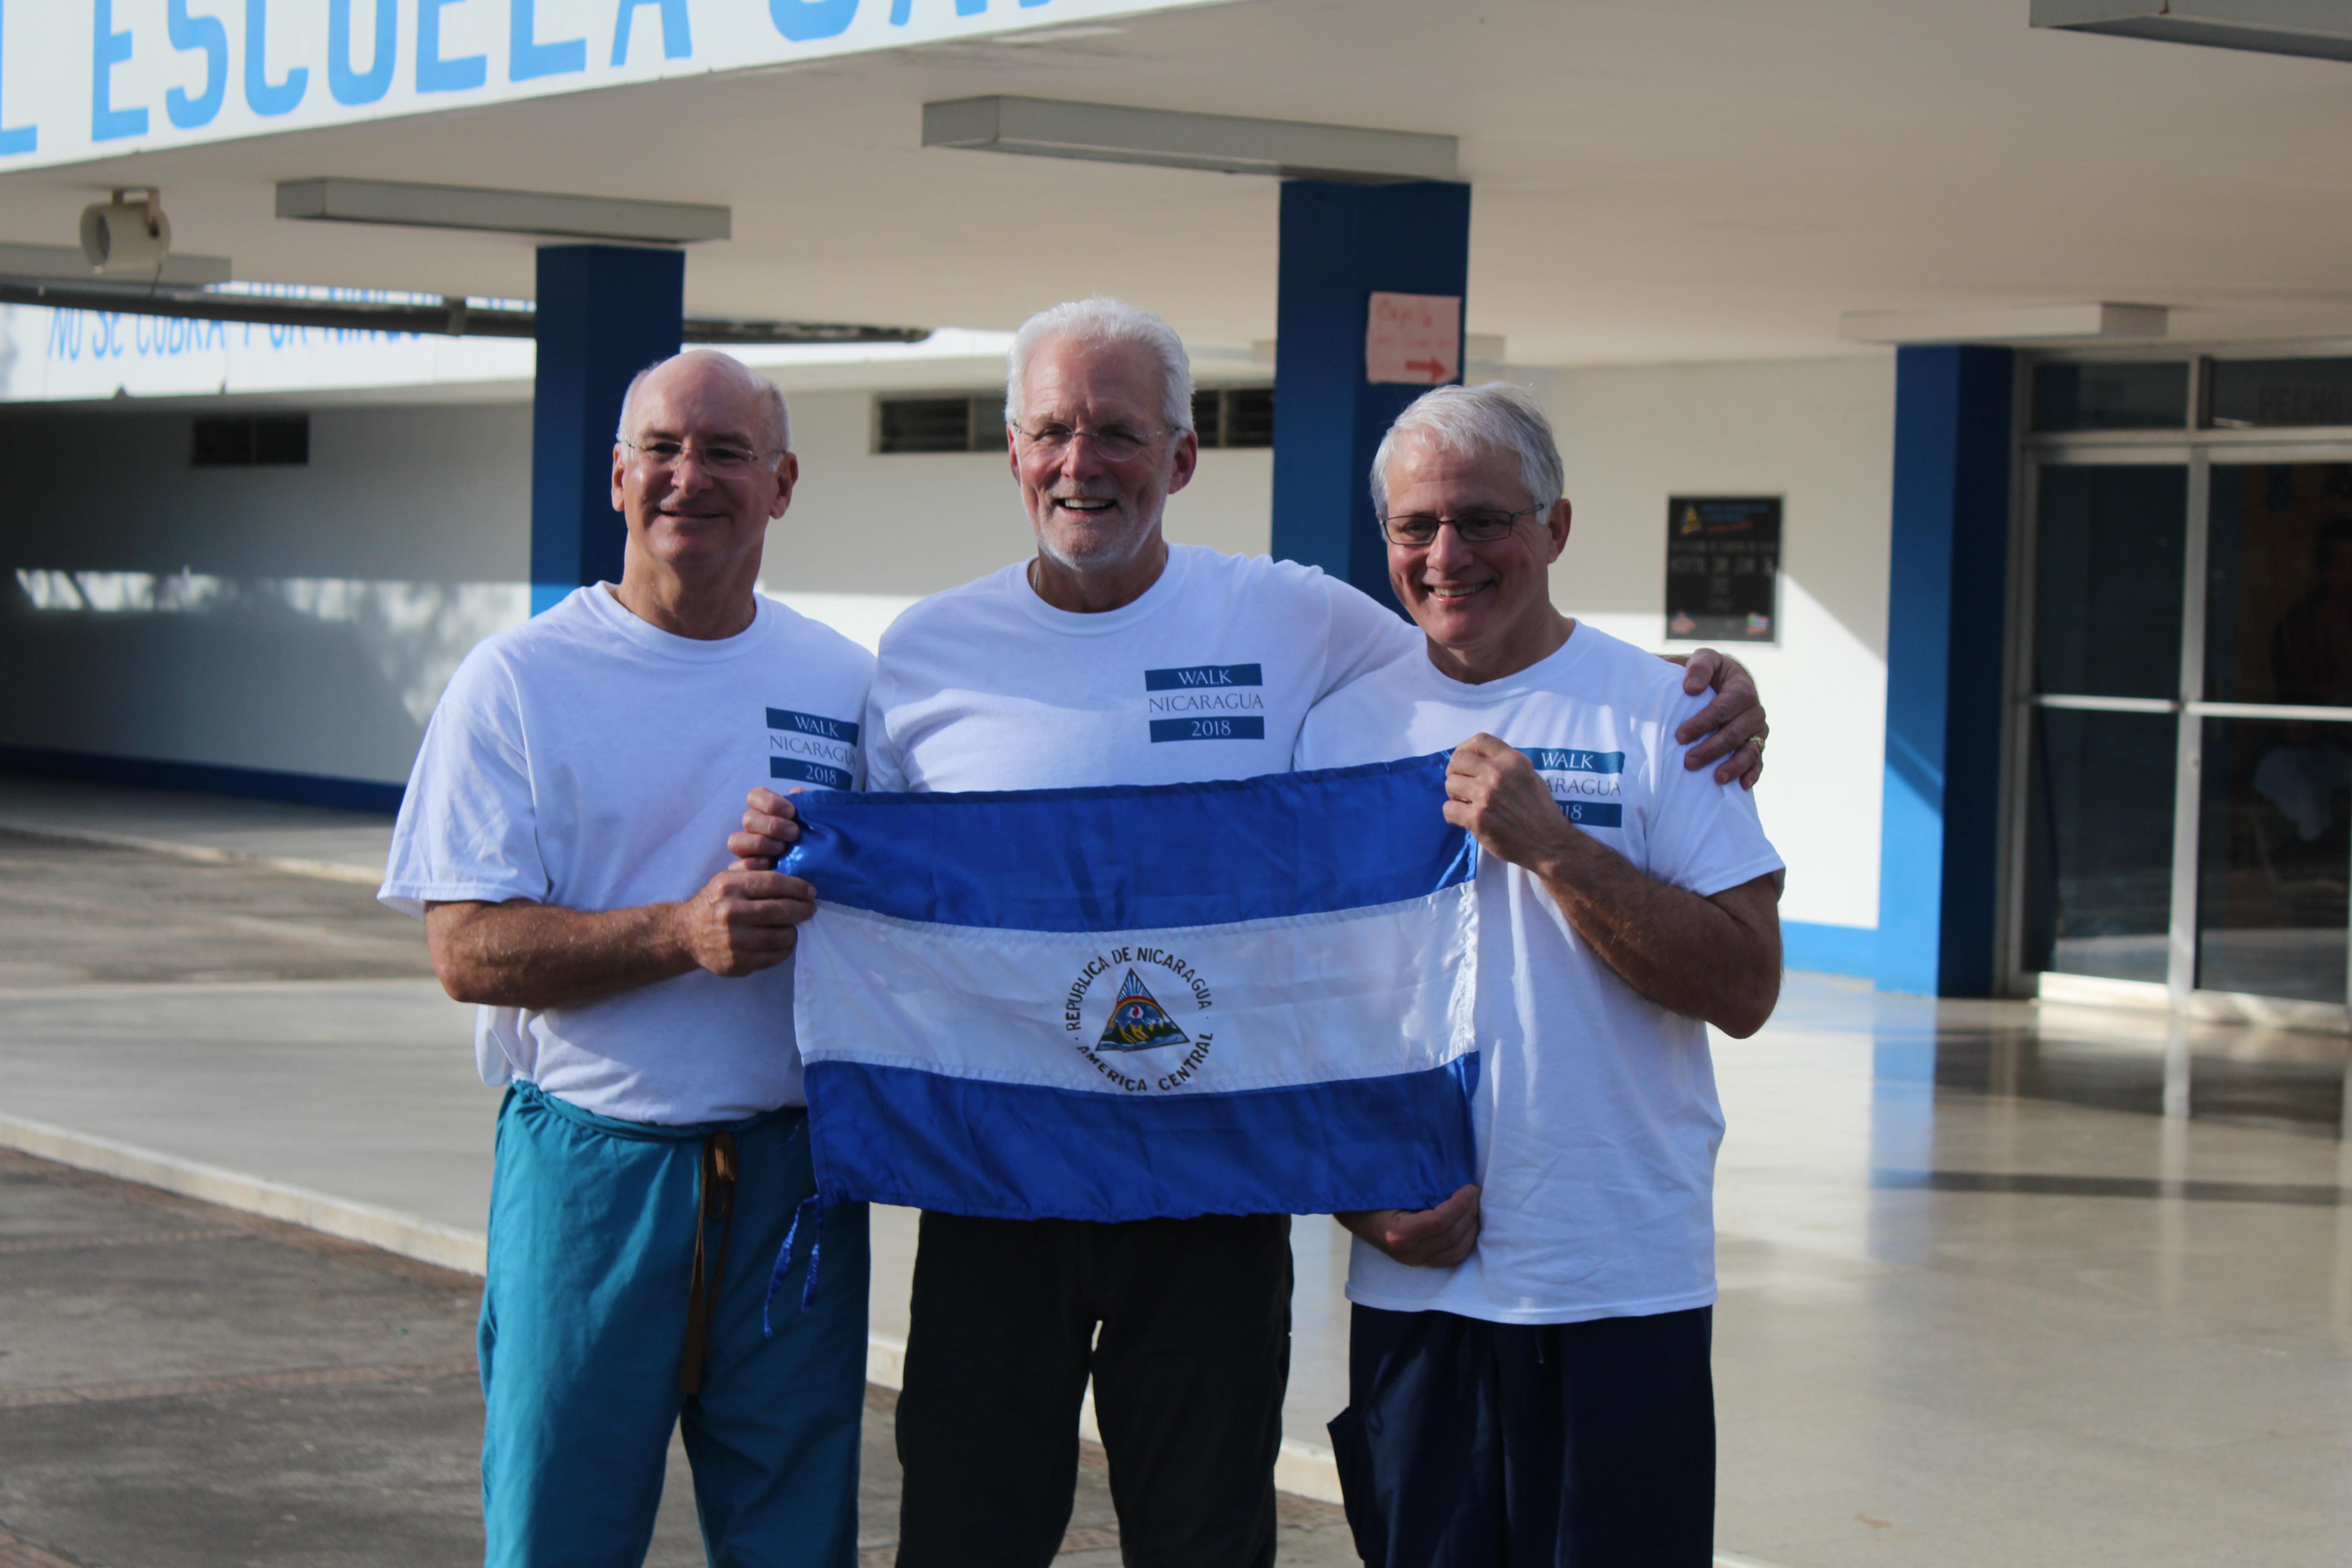 Our Surgeons: (Left to Right) Dr. Del Schutte, Jr., Dr. Kirk Johnson, Dr. Jim Jennings